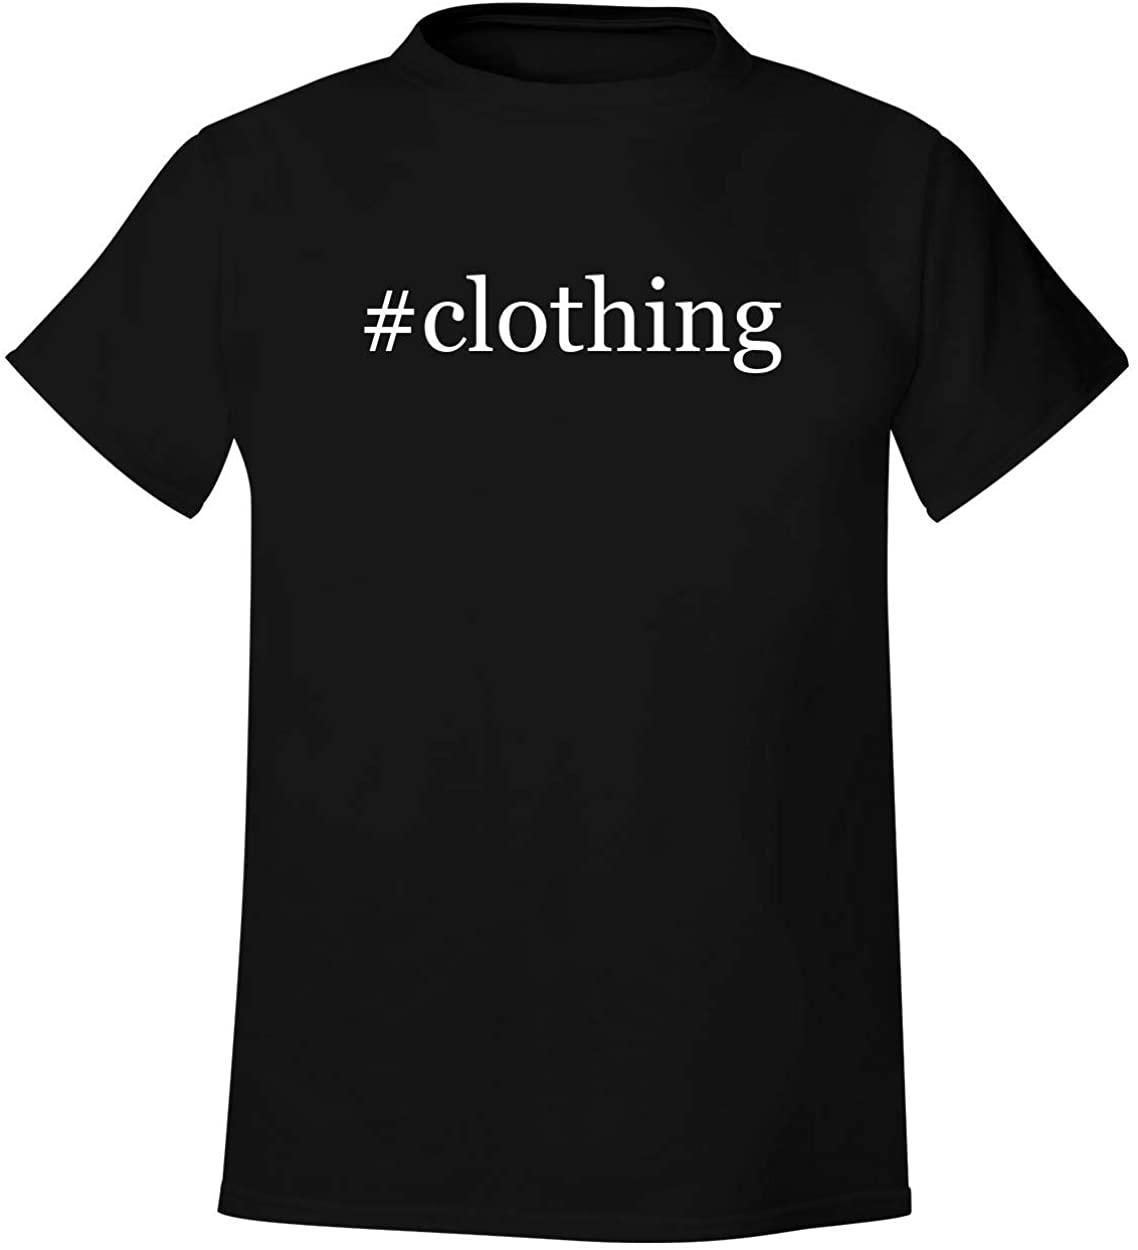 #clothing - Mens Hashtag Soft & Comfortable T-Shirt